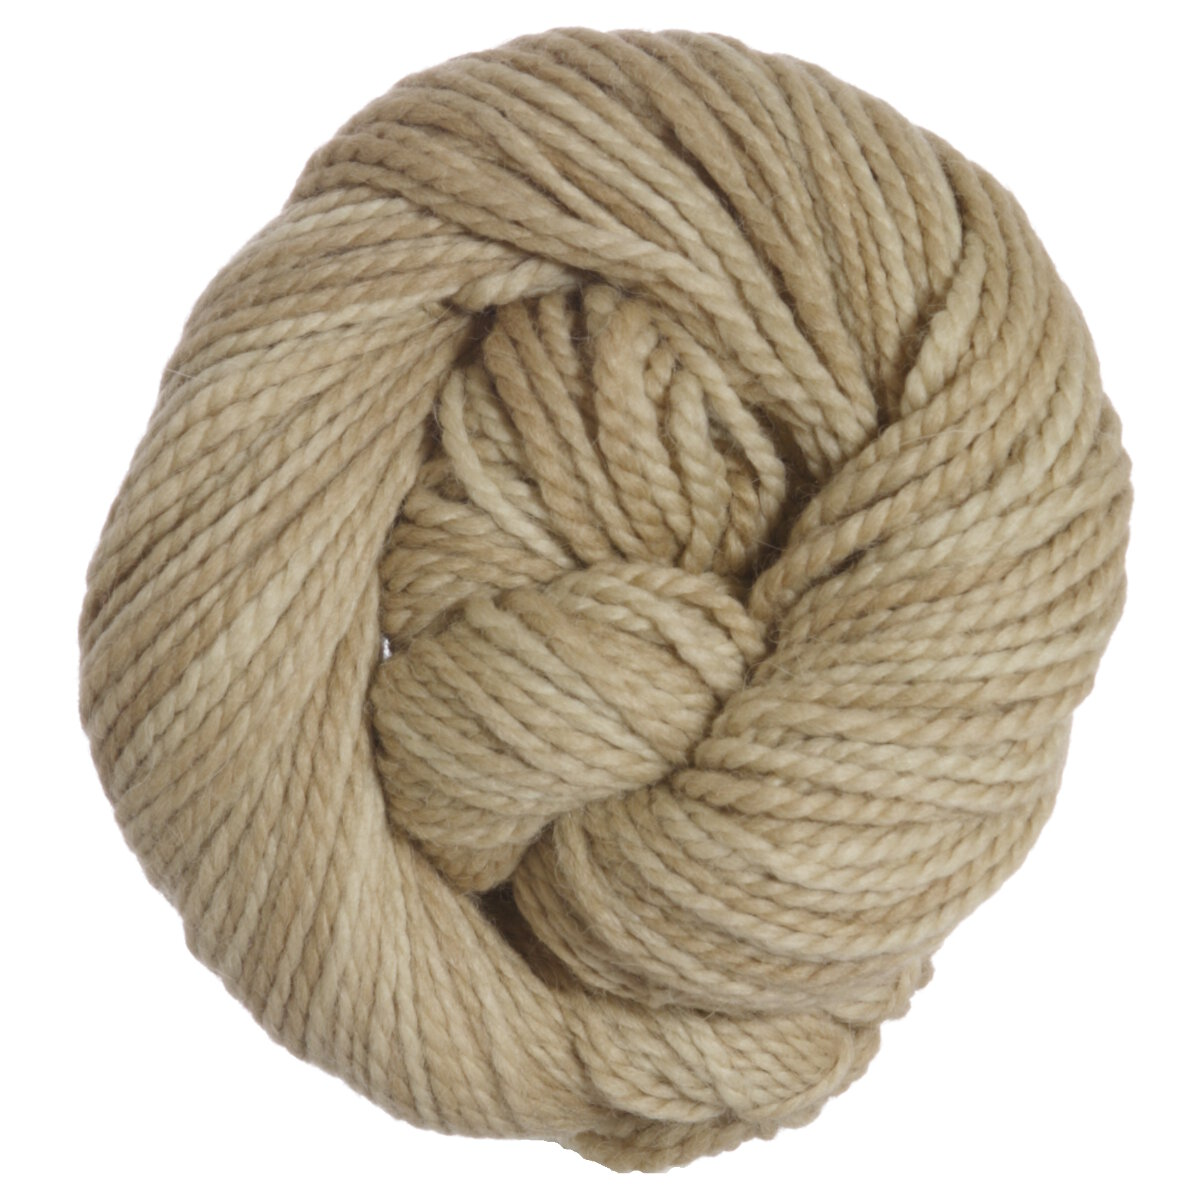 Knitting Patterns Alpaca Chunky : Berroco Ultra Alpaca Chunky Tonal Yarn at Jimmy Beans Wool